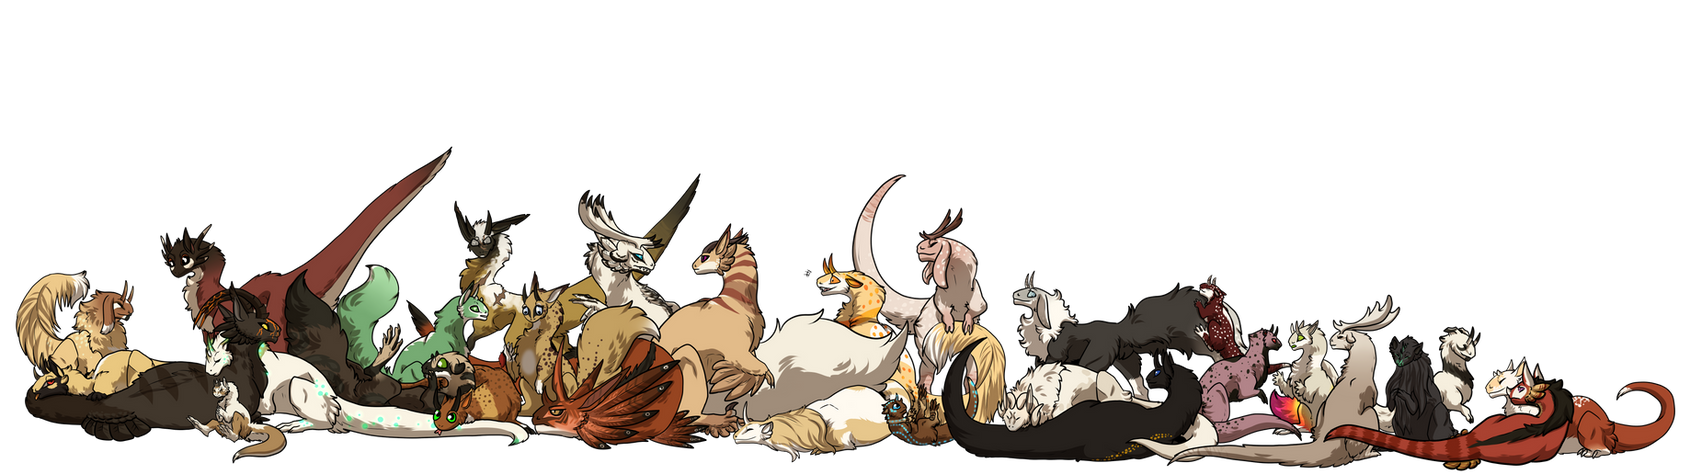 Admin Pile by Crashfurs